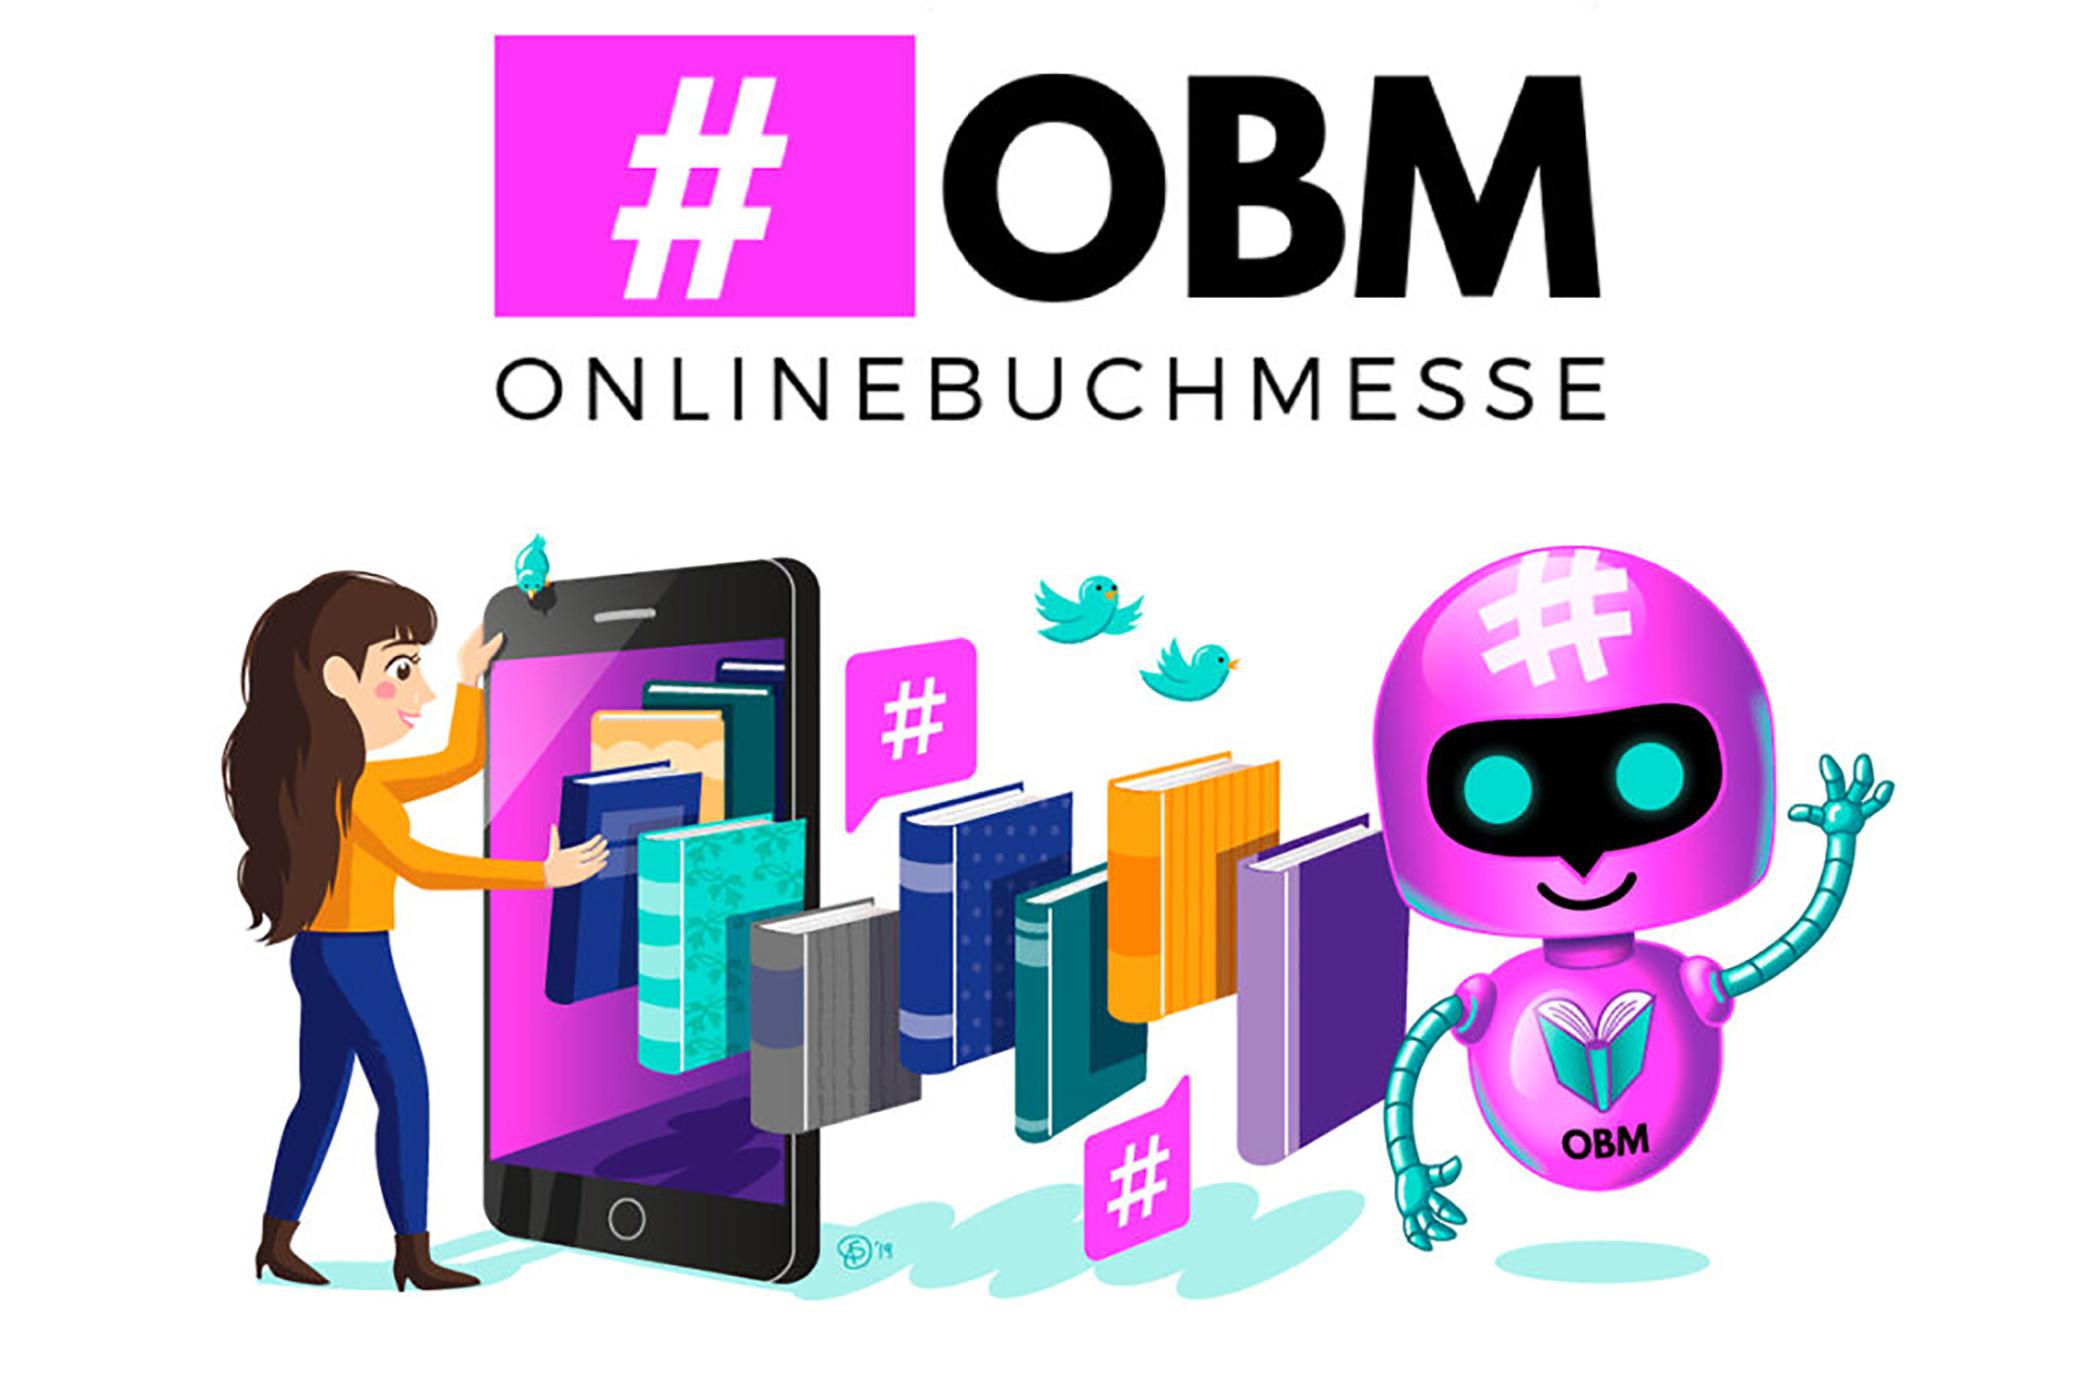 Online Buchmesse